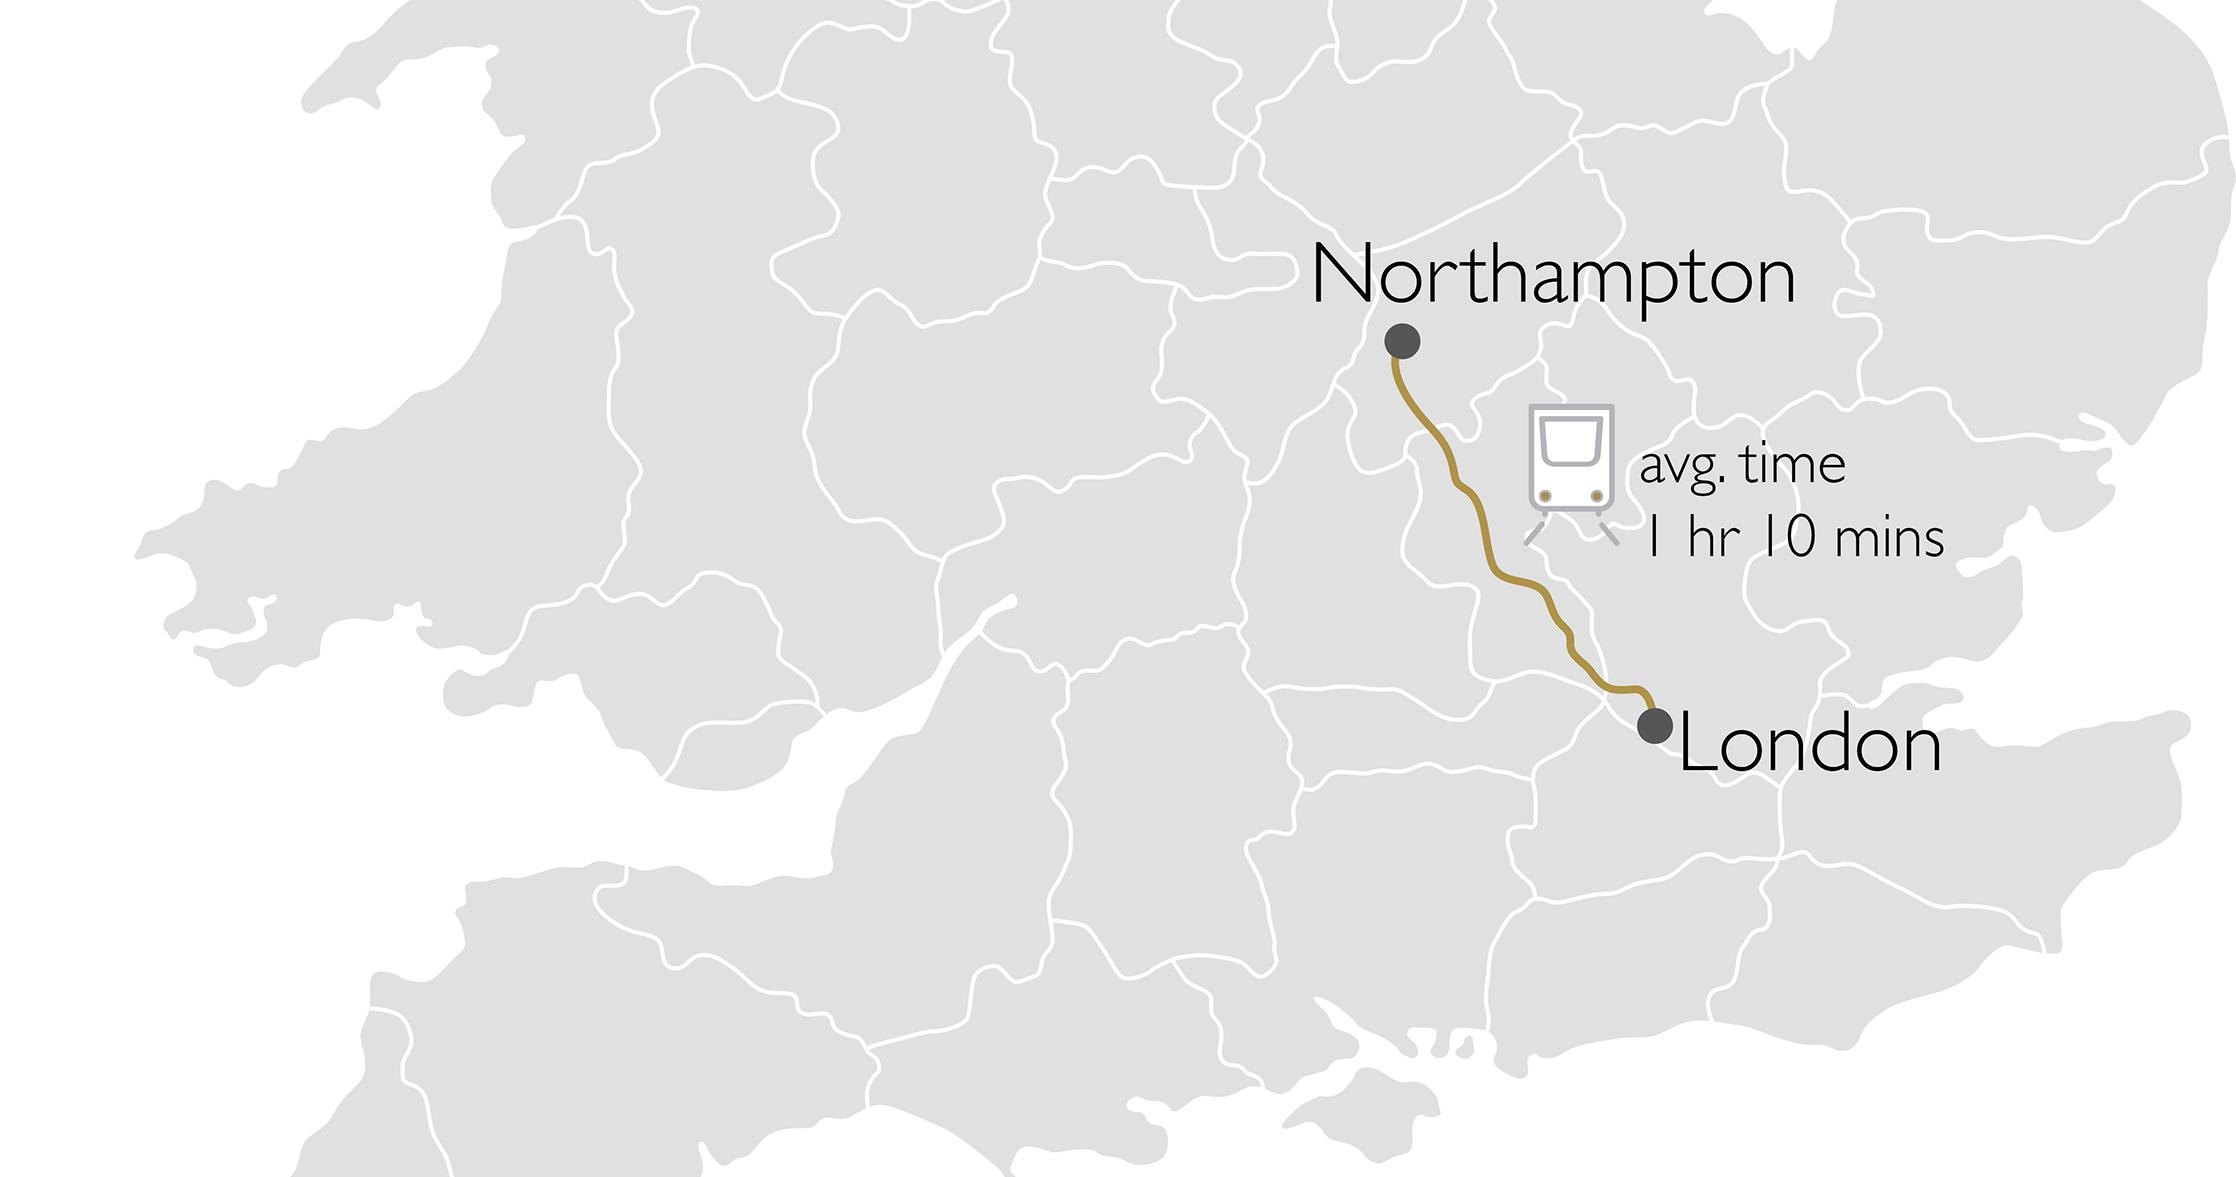 Northampton commute